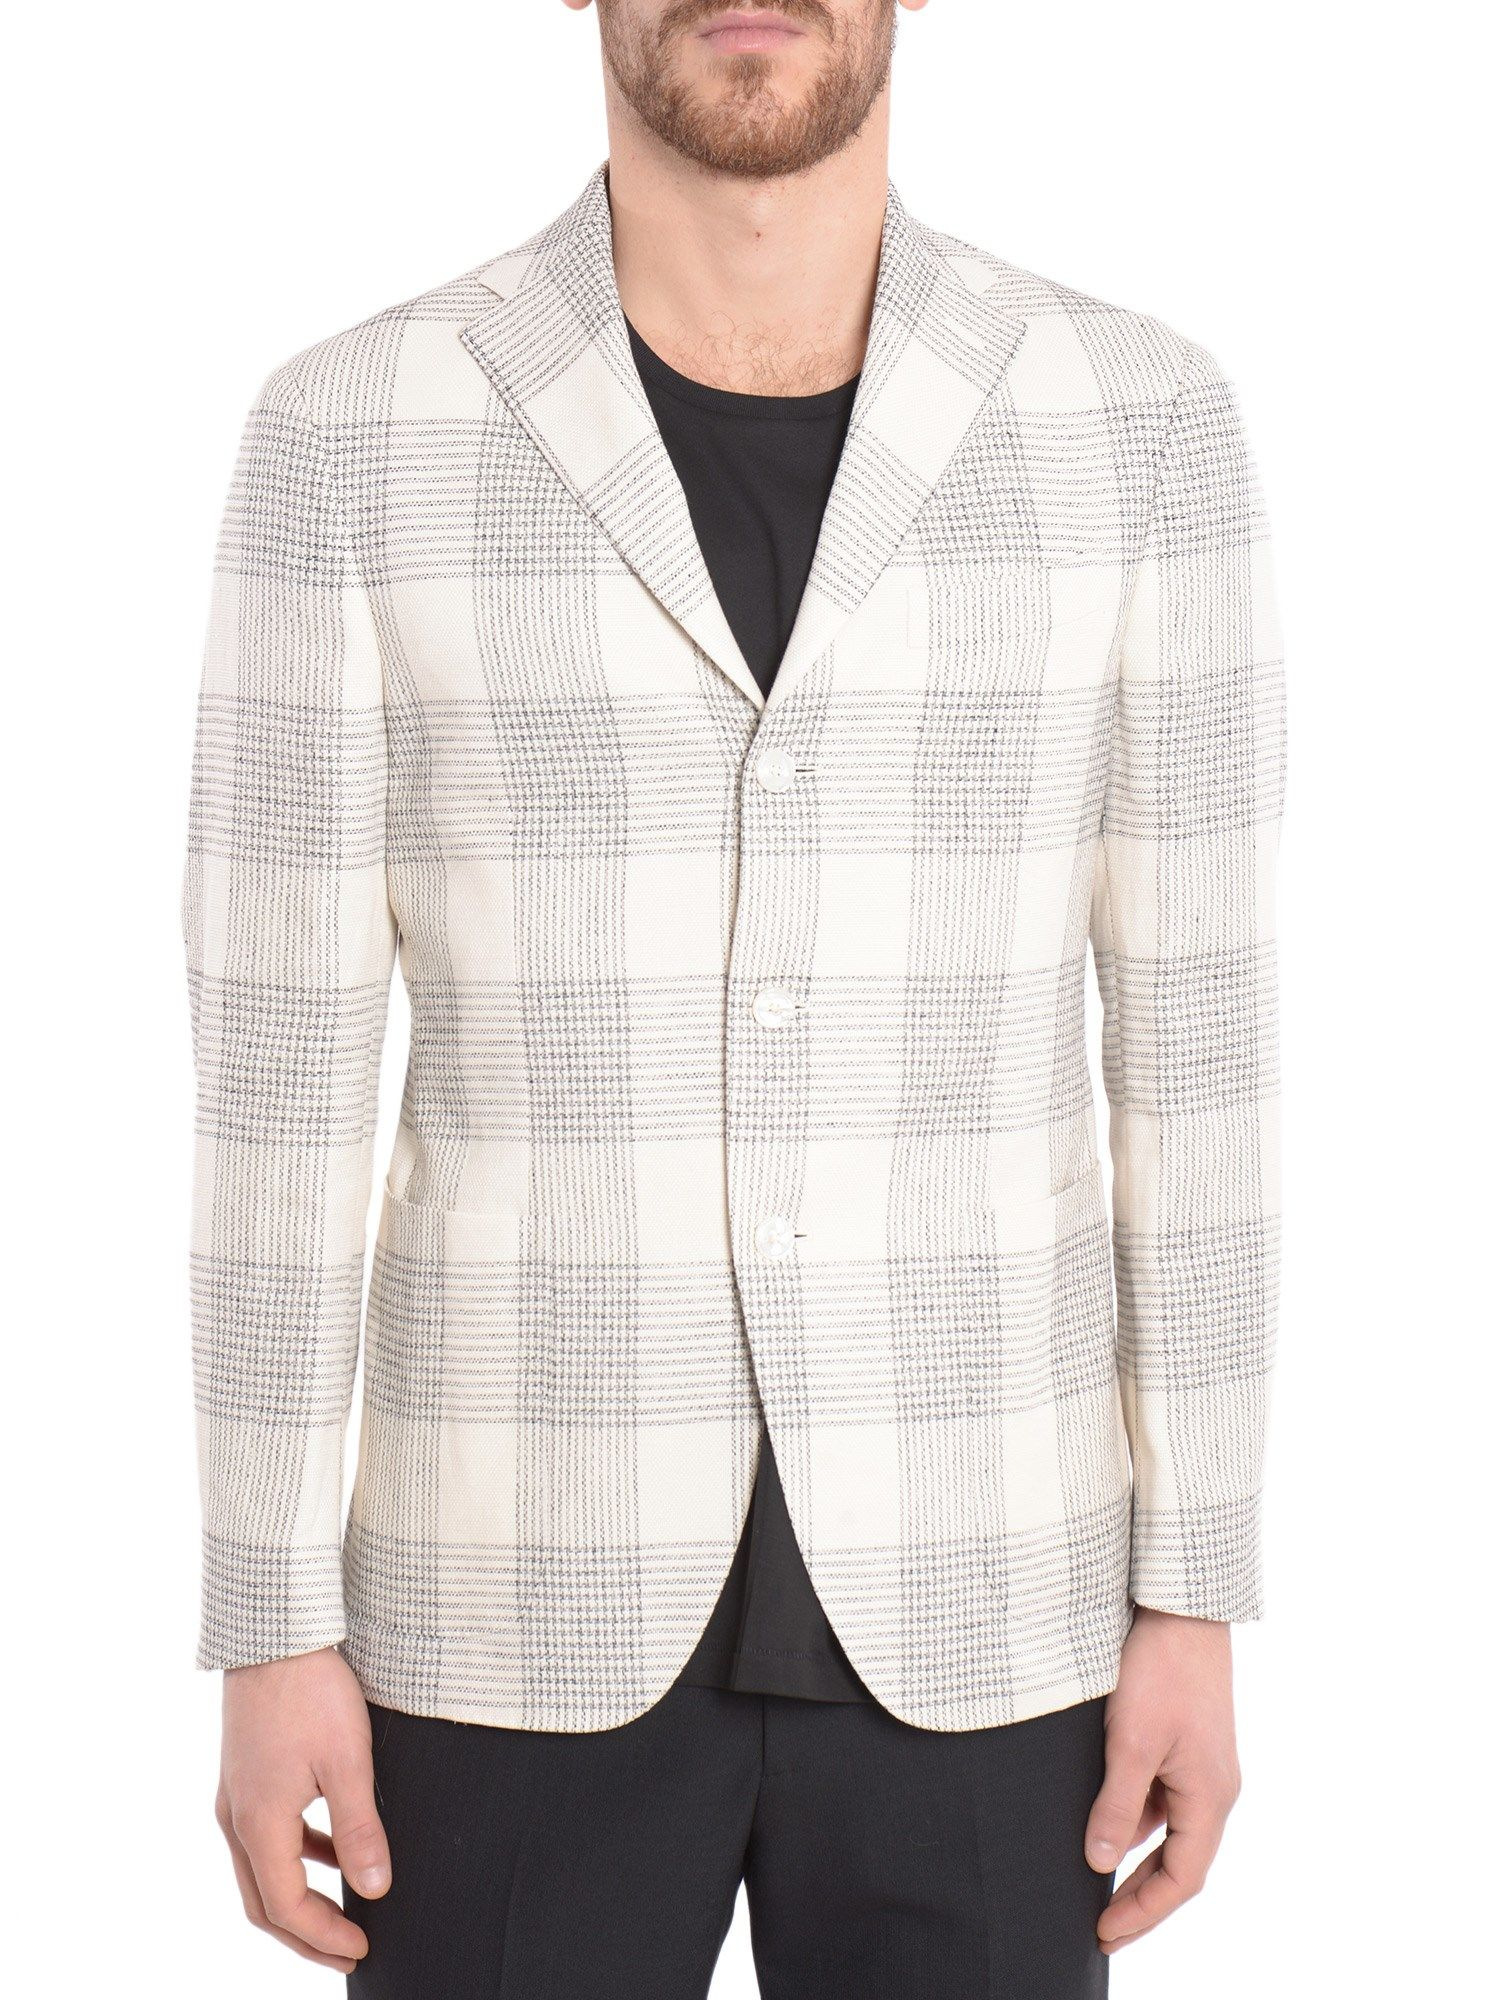 Degas Jacket